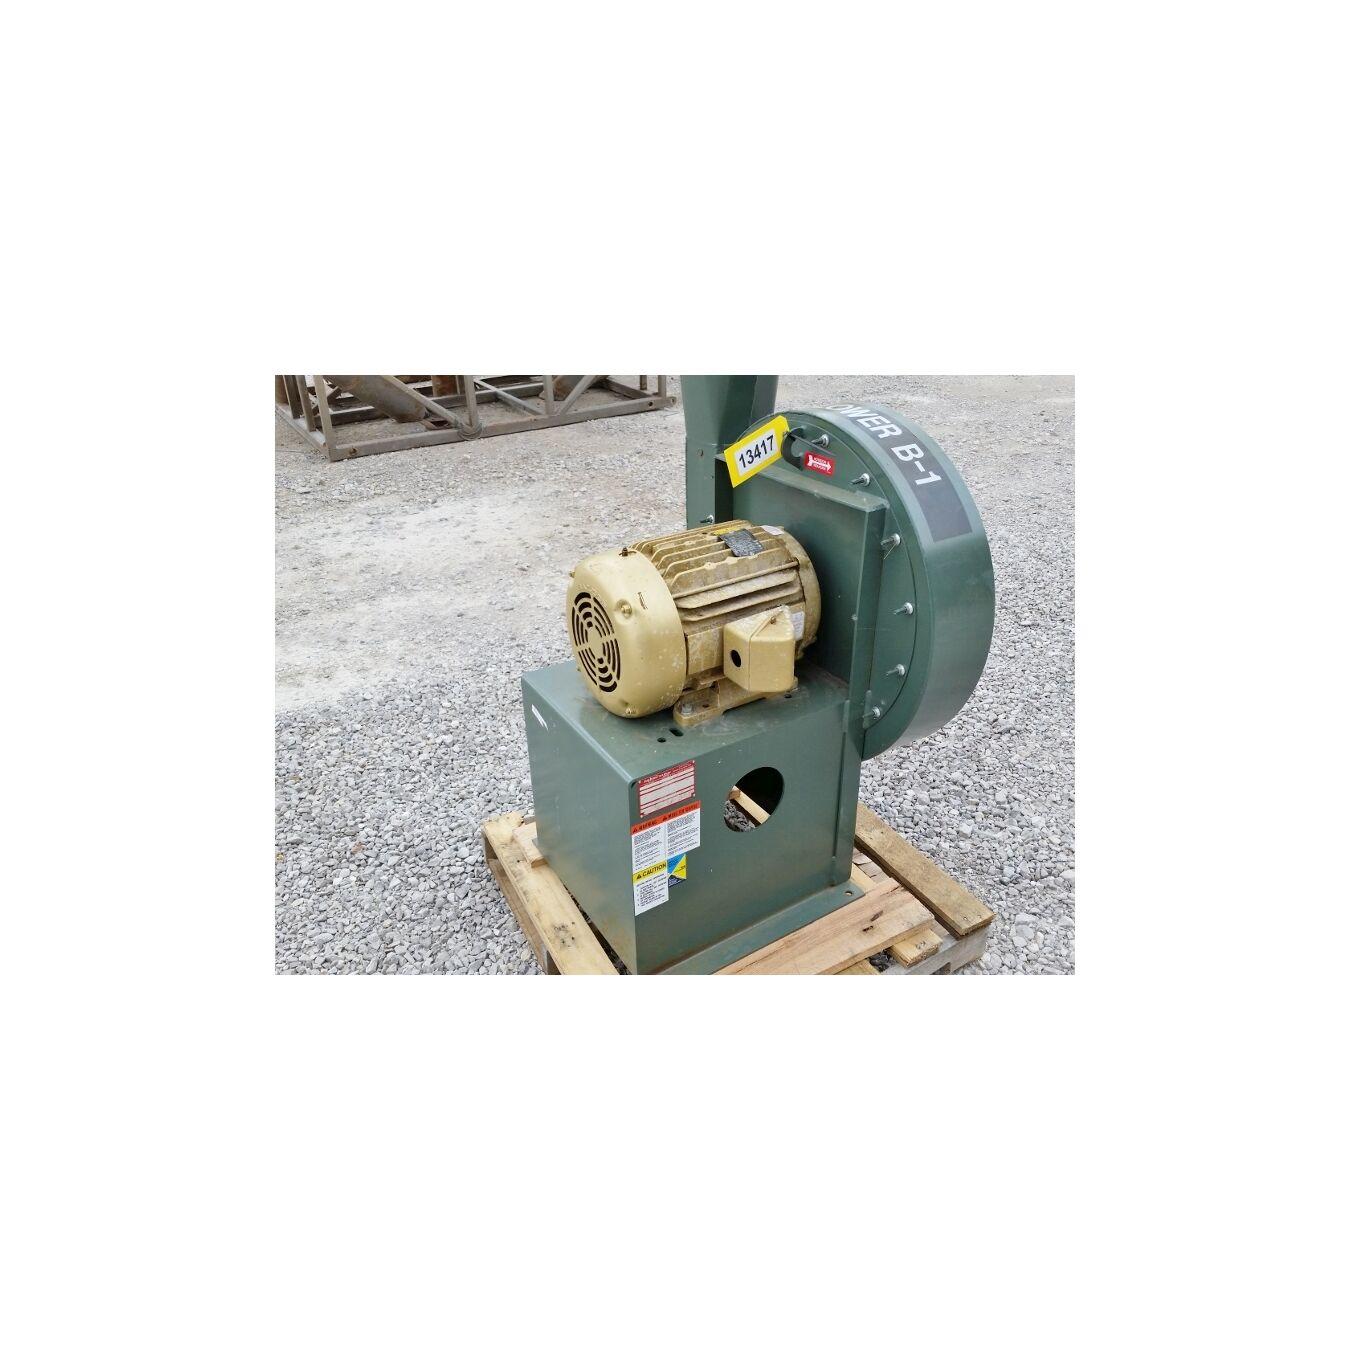 New York Blower Pressure Blower : Used new york pressure blower fan cfm quot sp